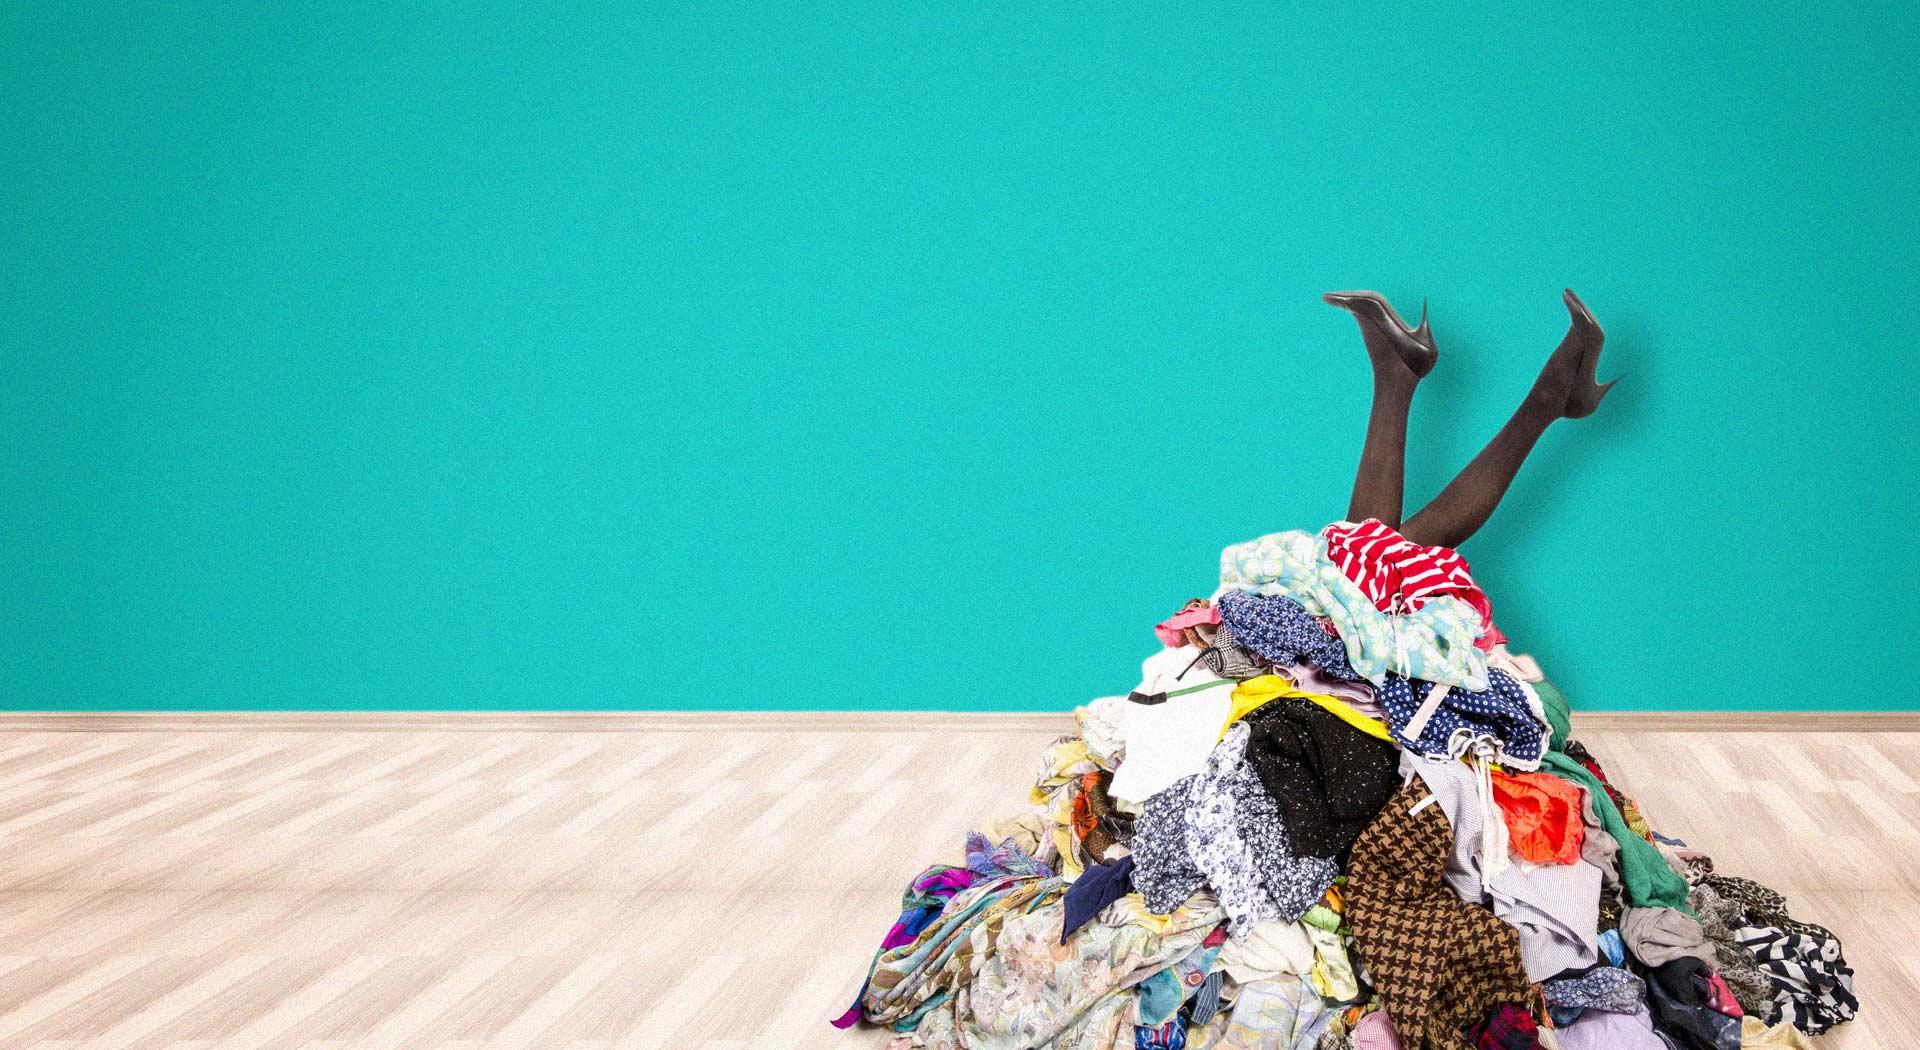 Druk na tkaninach w Pinsoli